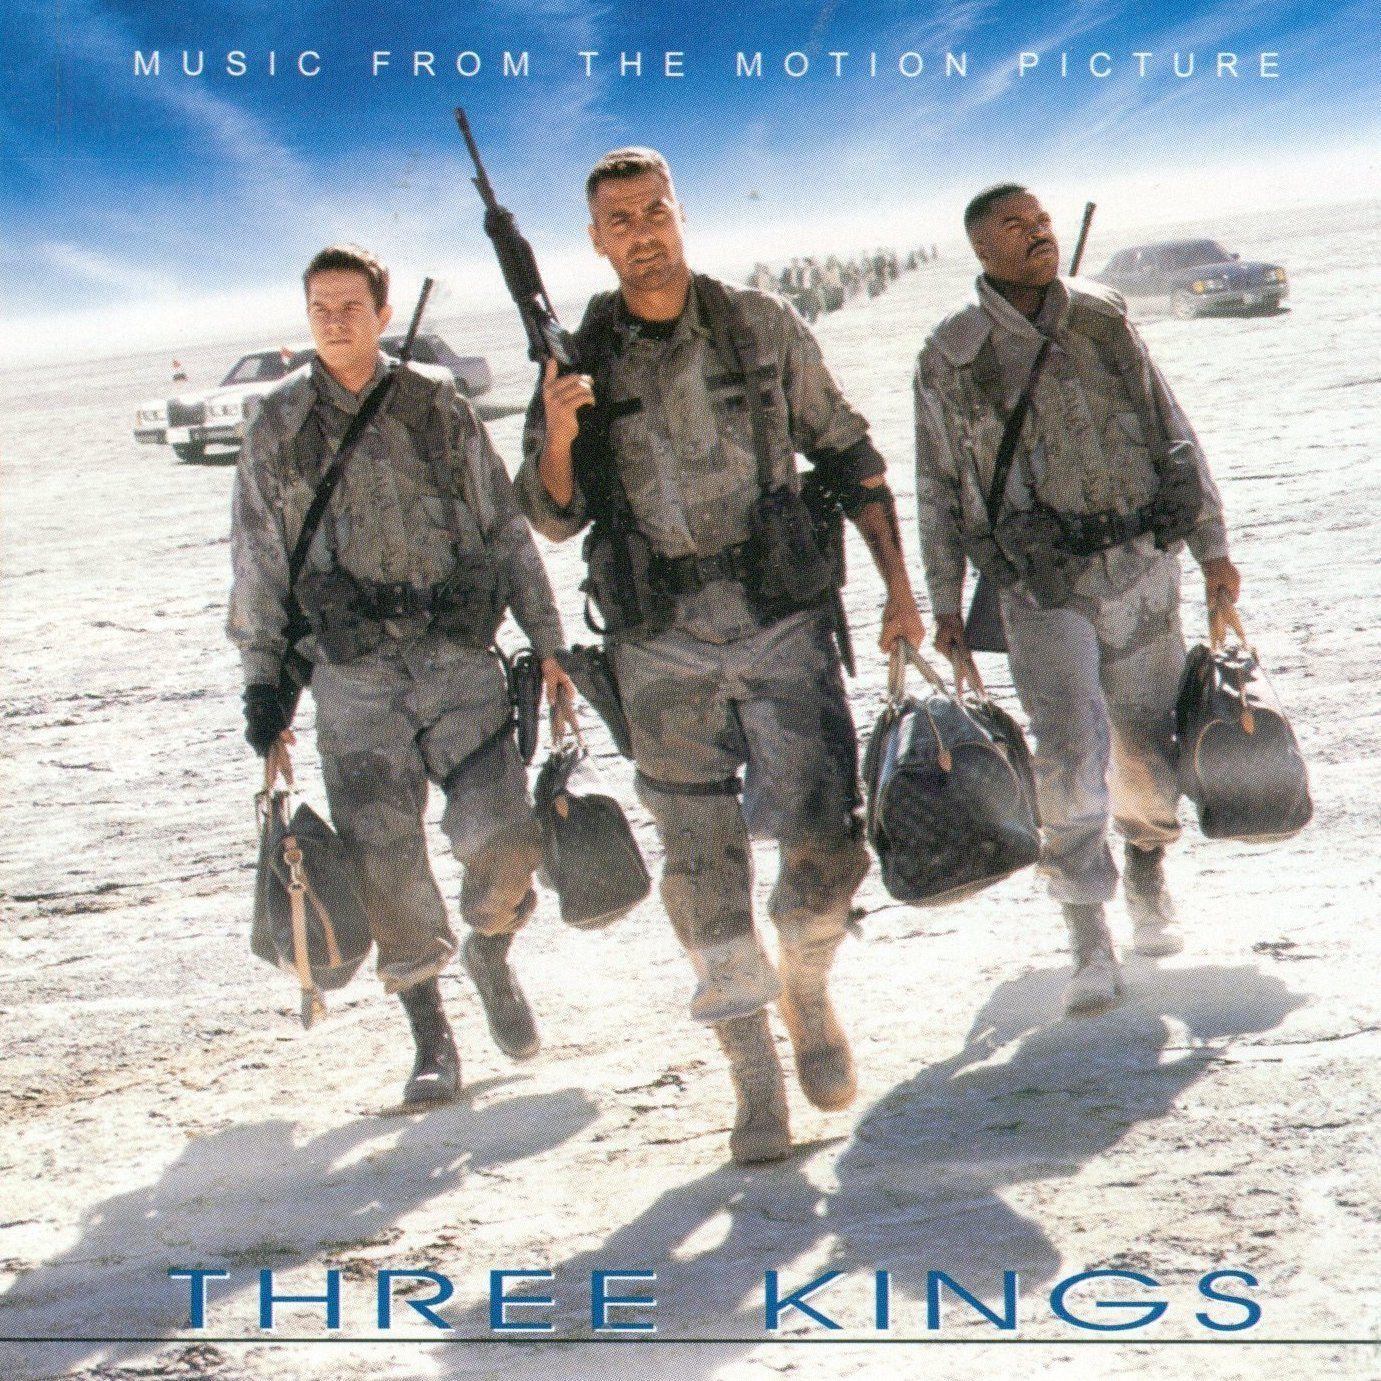 Three Kings Movie Soundtrack 1999 Kings Movie Full Movies Online Free Three Kings